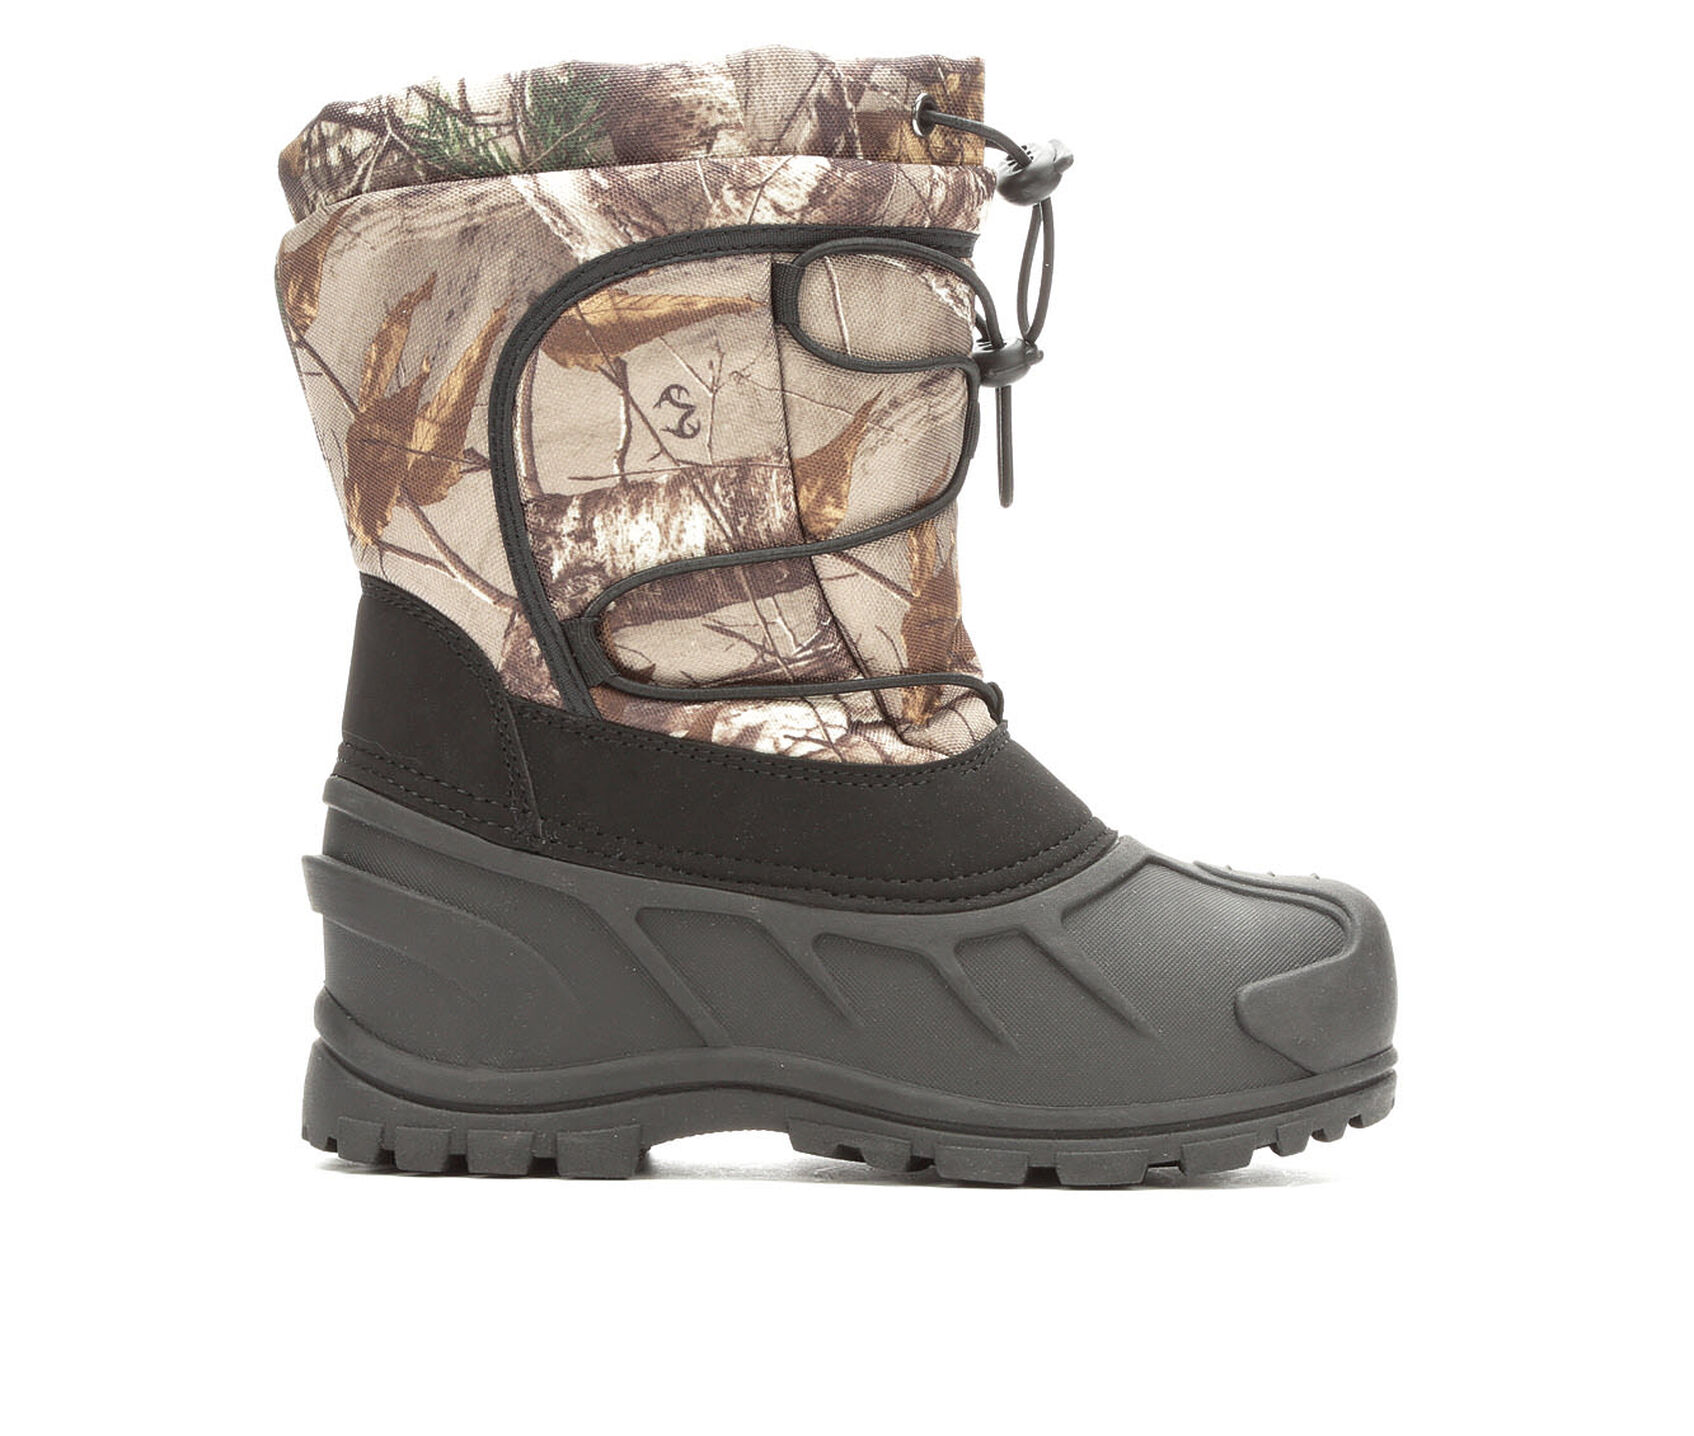 6db7246161f Boys' Itasca Sonoma Little Kid & Big Kid Cerebus Realtree Winter Boots